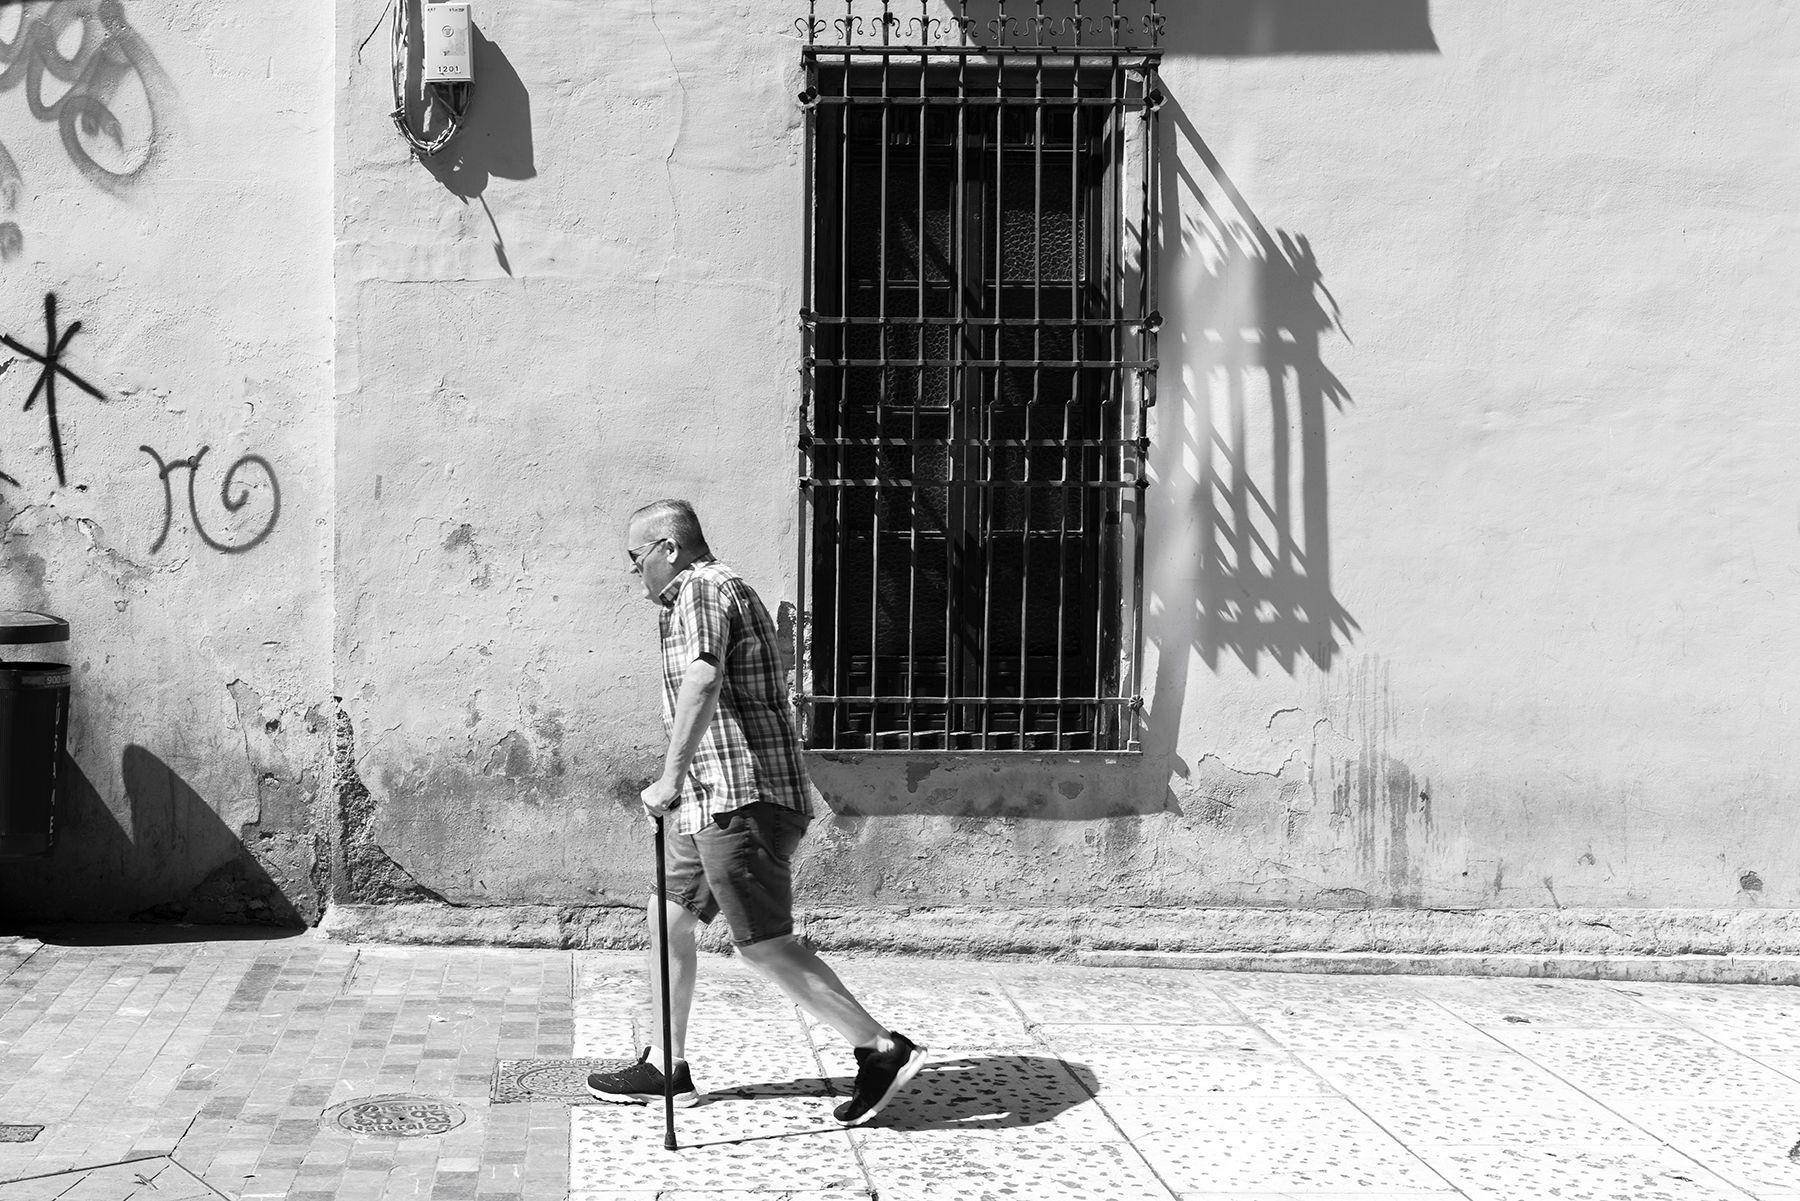 Hombre con bastón